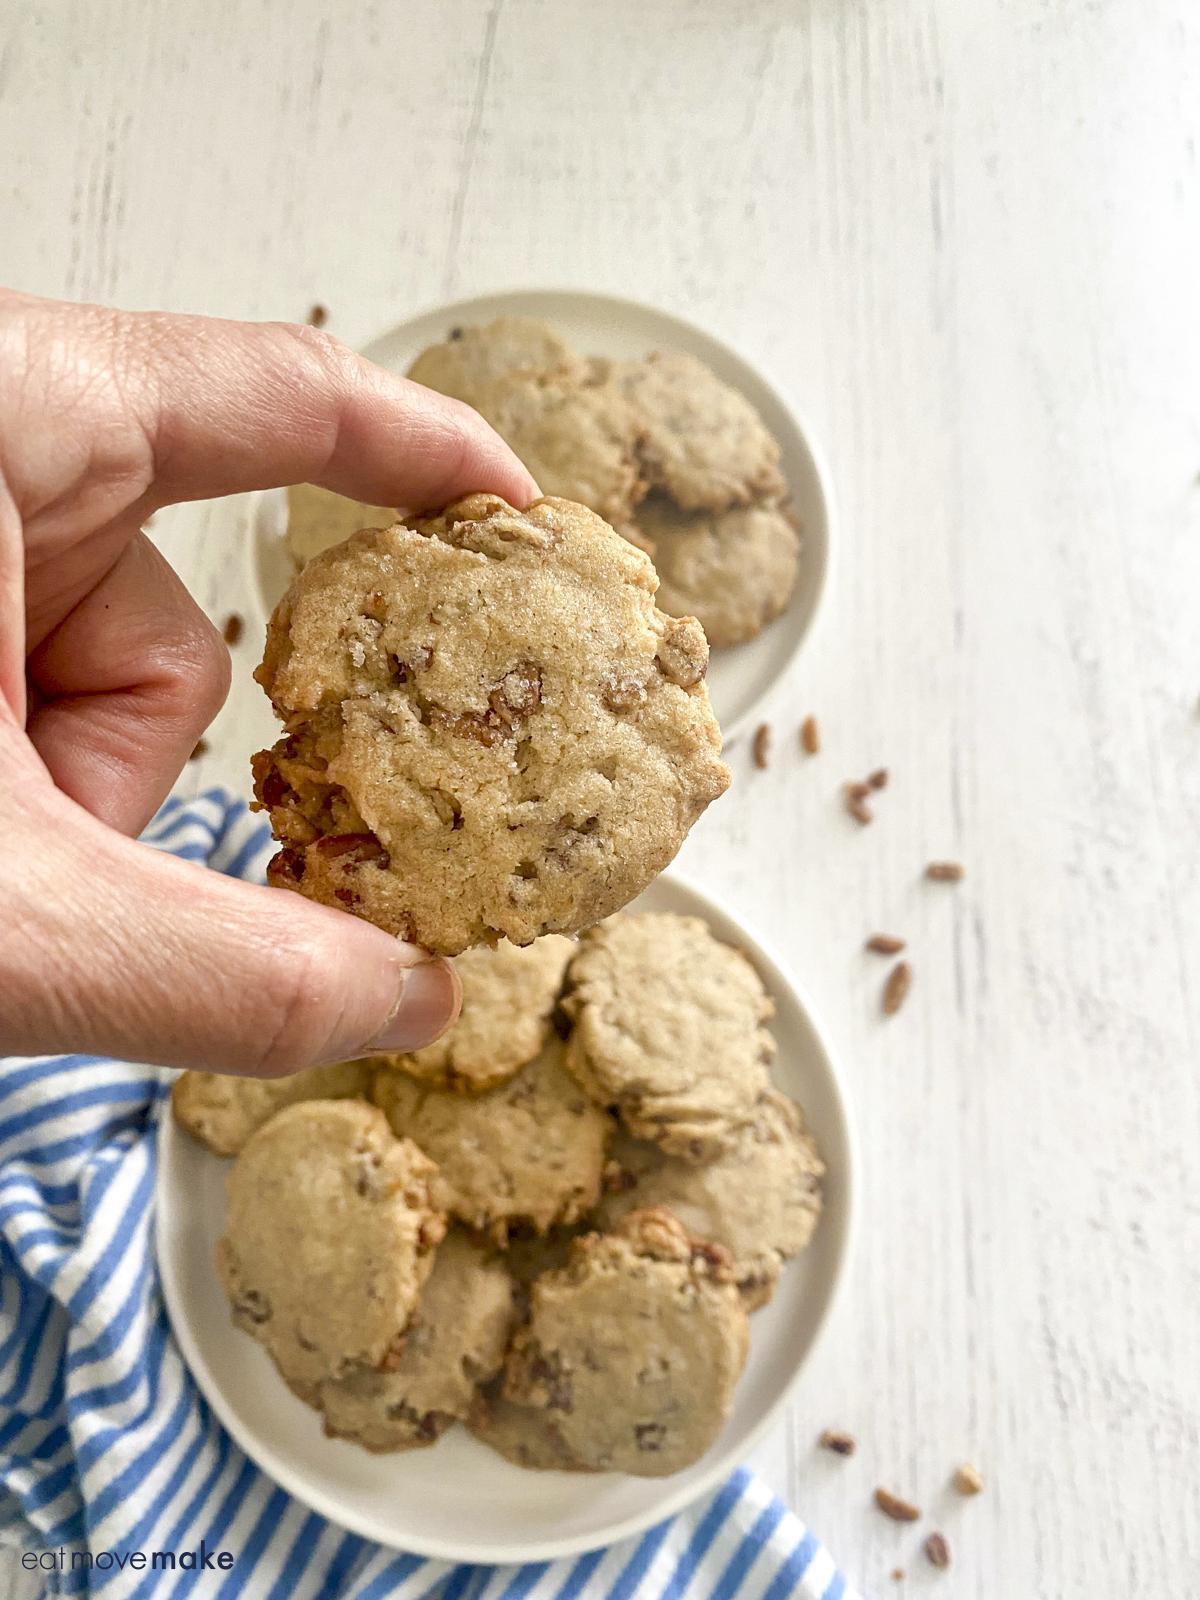 hand holding pecan cookie